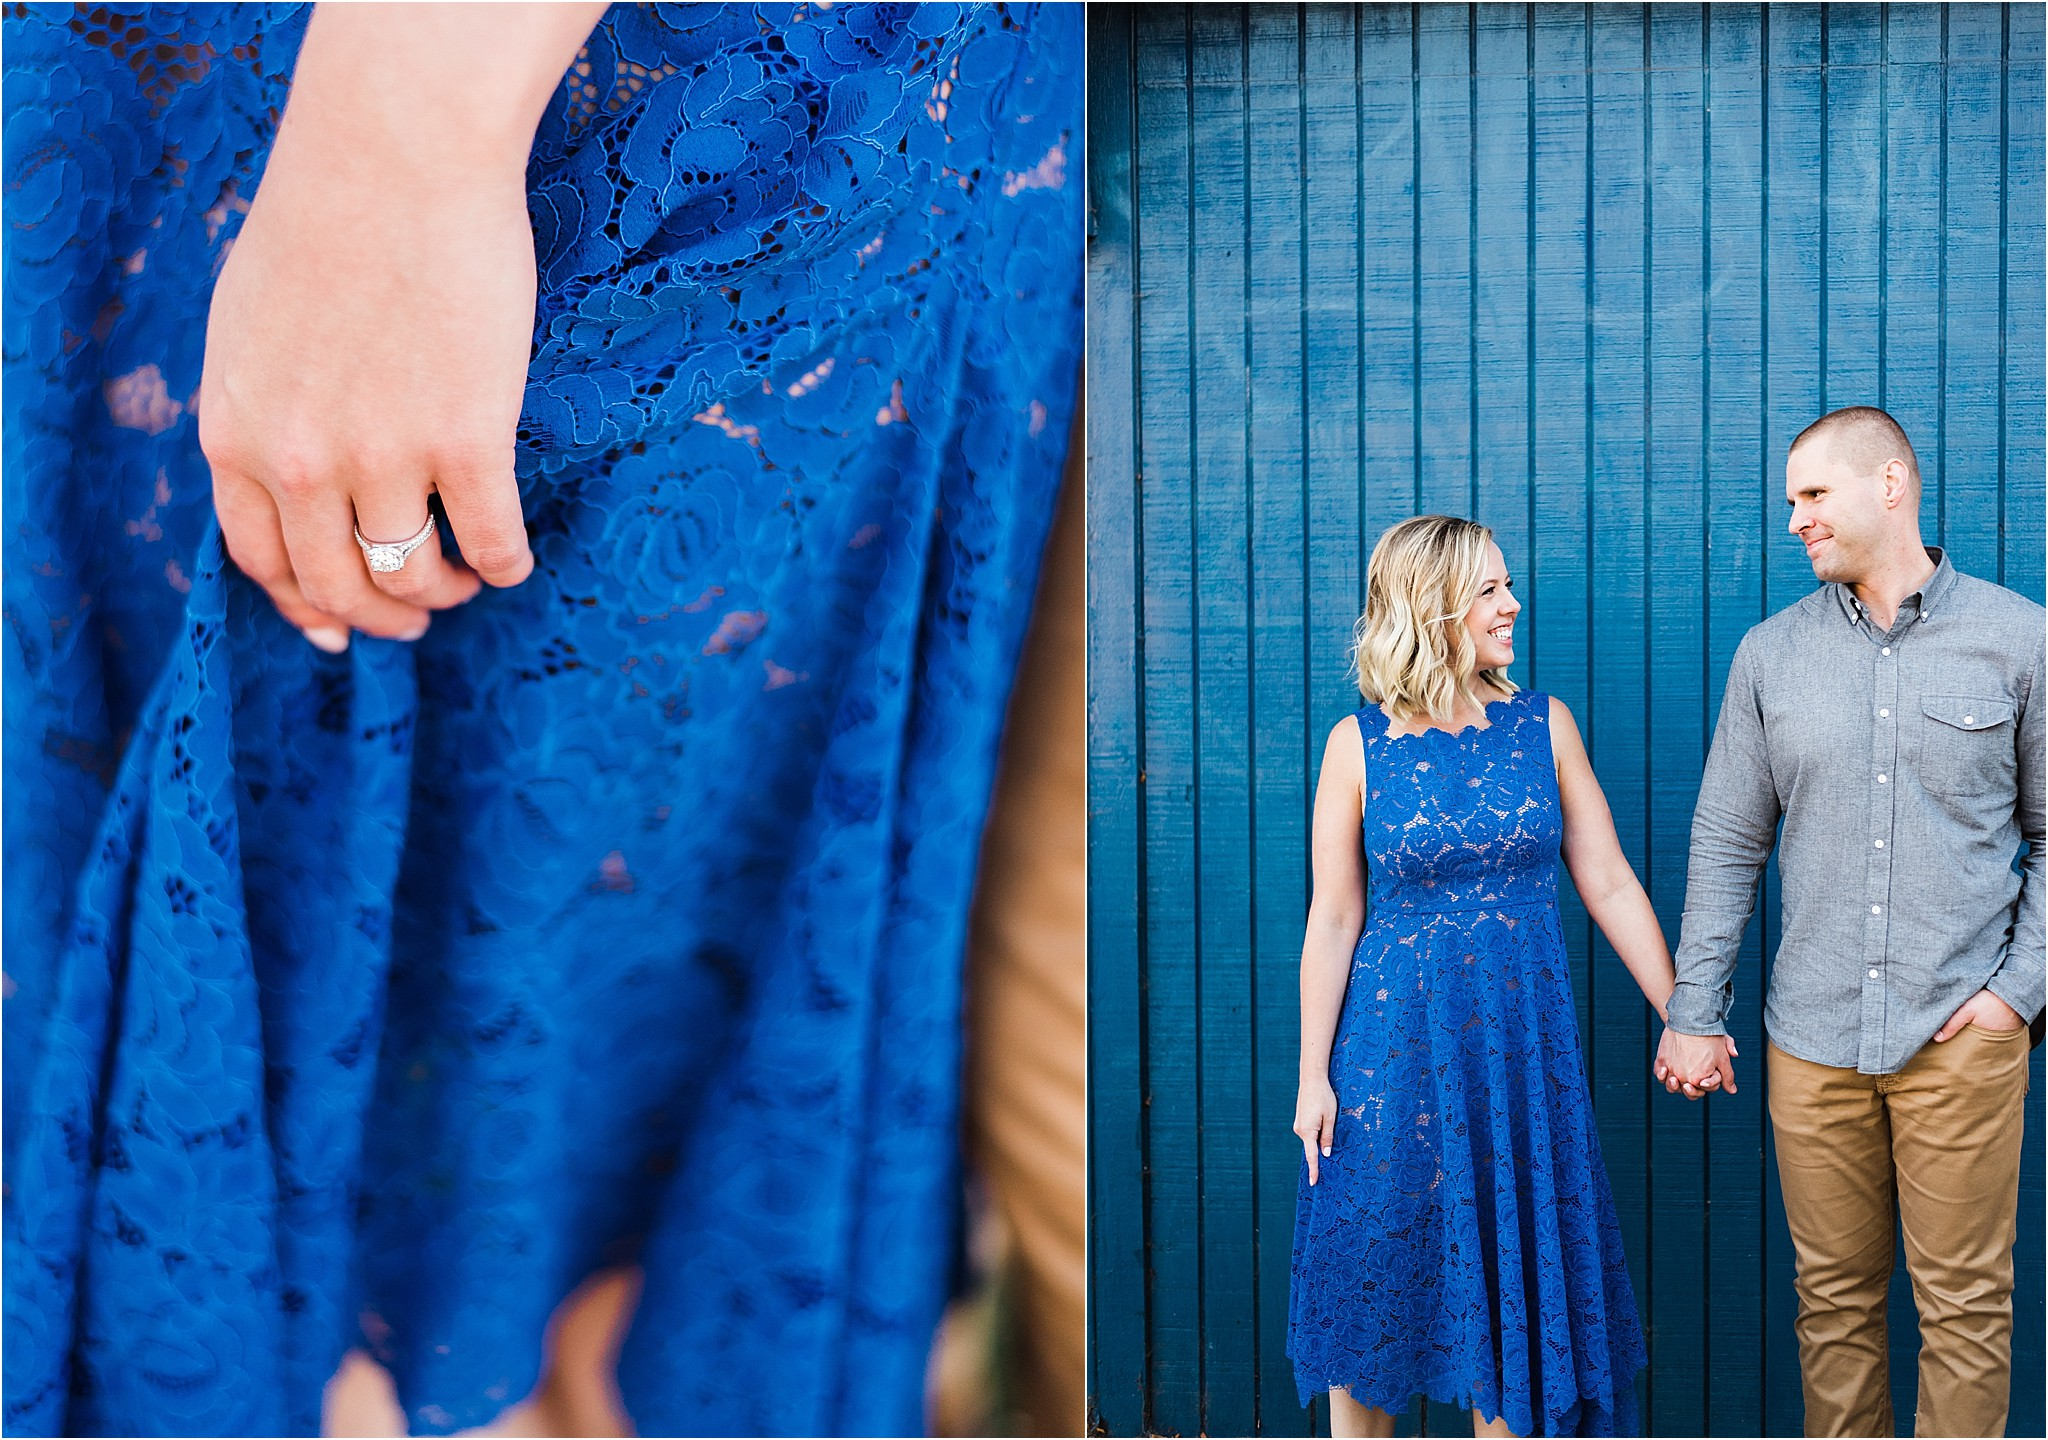 lish-marie-photography-wedding-photographer-chicago-west-loop_0011.jpg